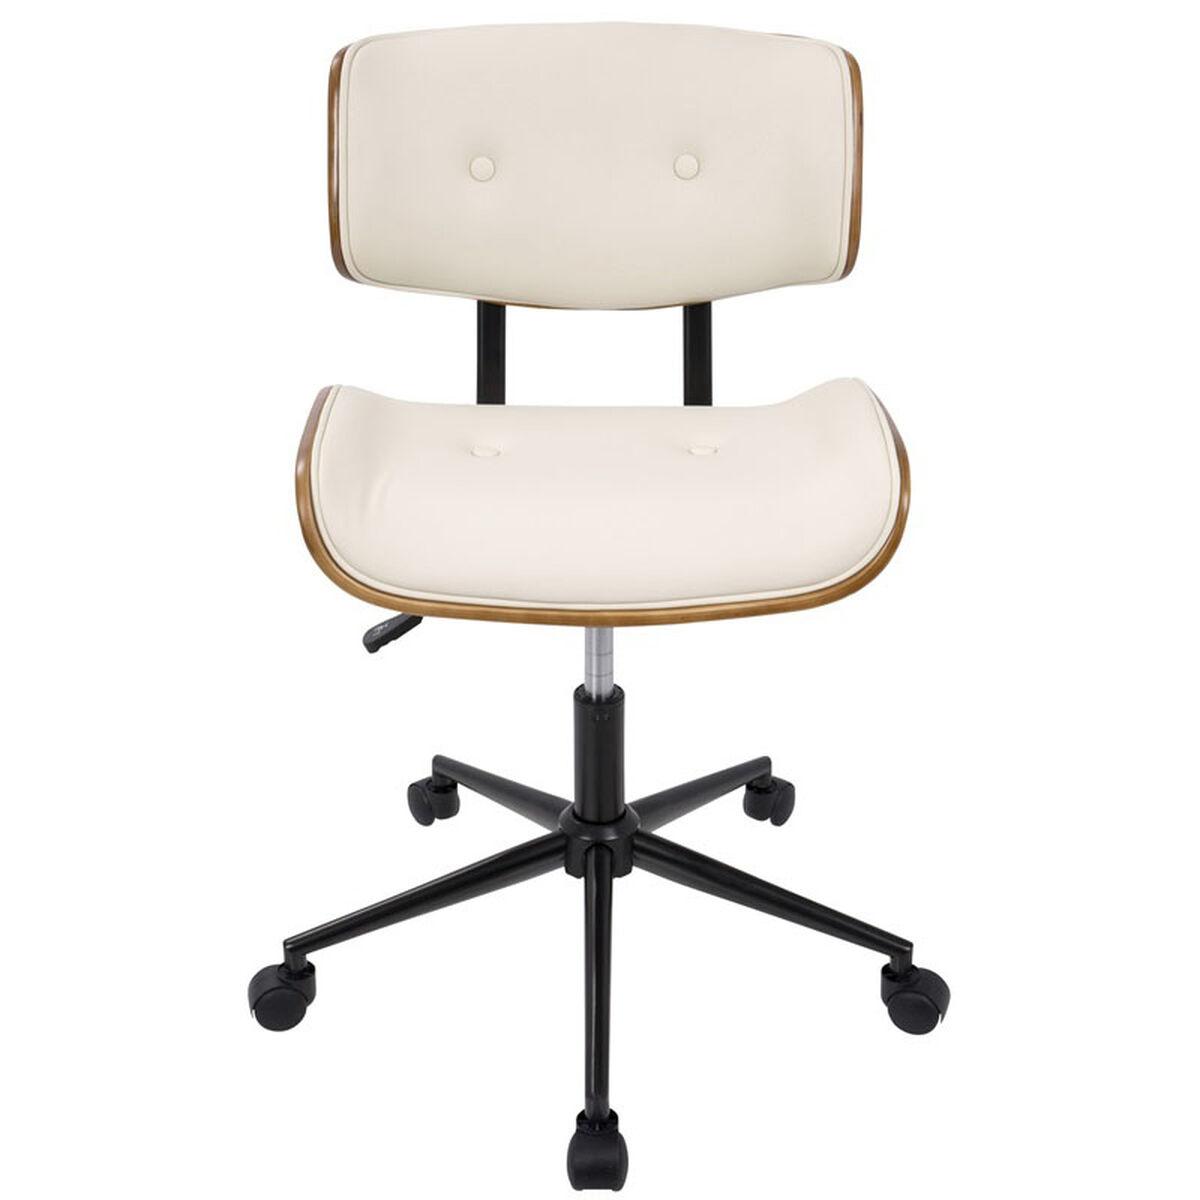 Lombardi Cream Office Chair Oc Jy Lmb Wl Cr Bizchaircom